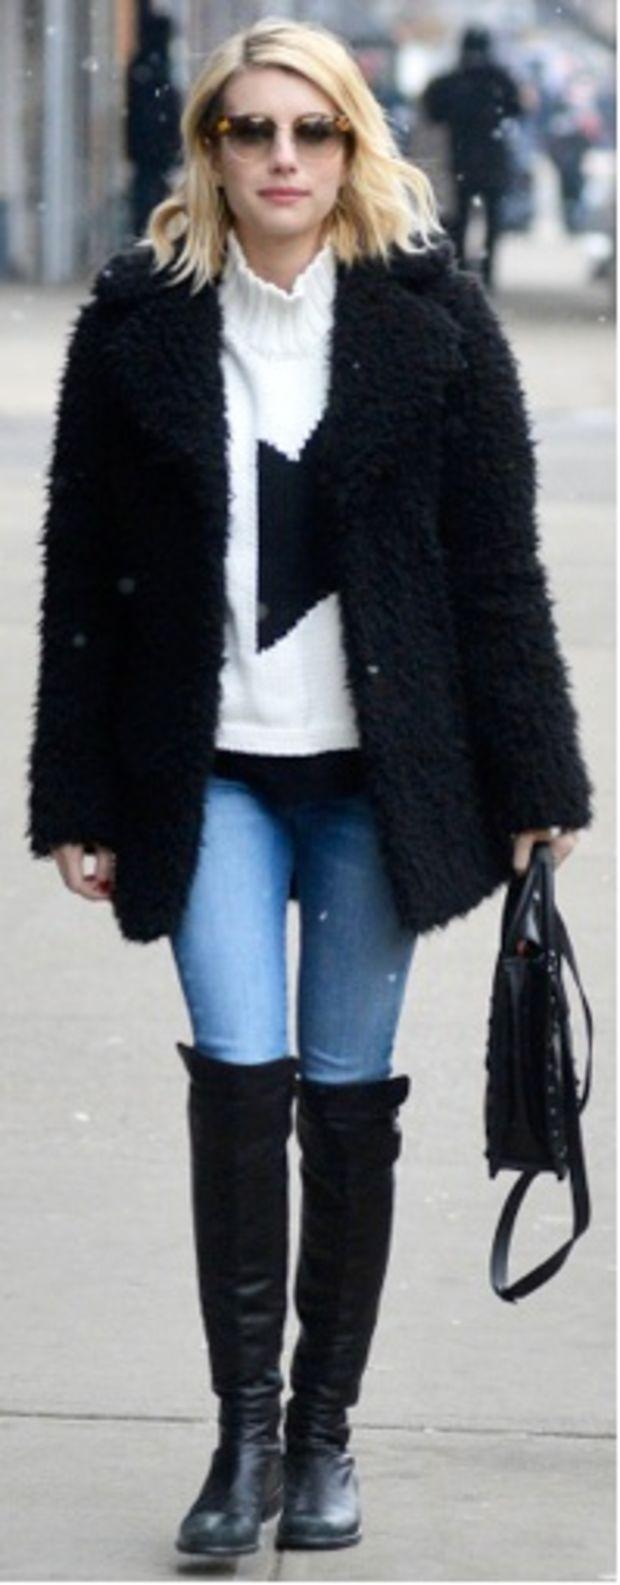 blue-light-skinny-jeans-white-sweater-black-jacket-coat-fur-fuzz-sun-black-shoe-boots-black-bag-howtowear-fashion-style-outfit-fall-winter-turtleneck-emmarobertscelebrity-street-blonde-weekend.jpg